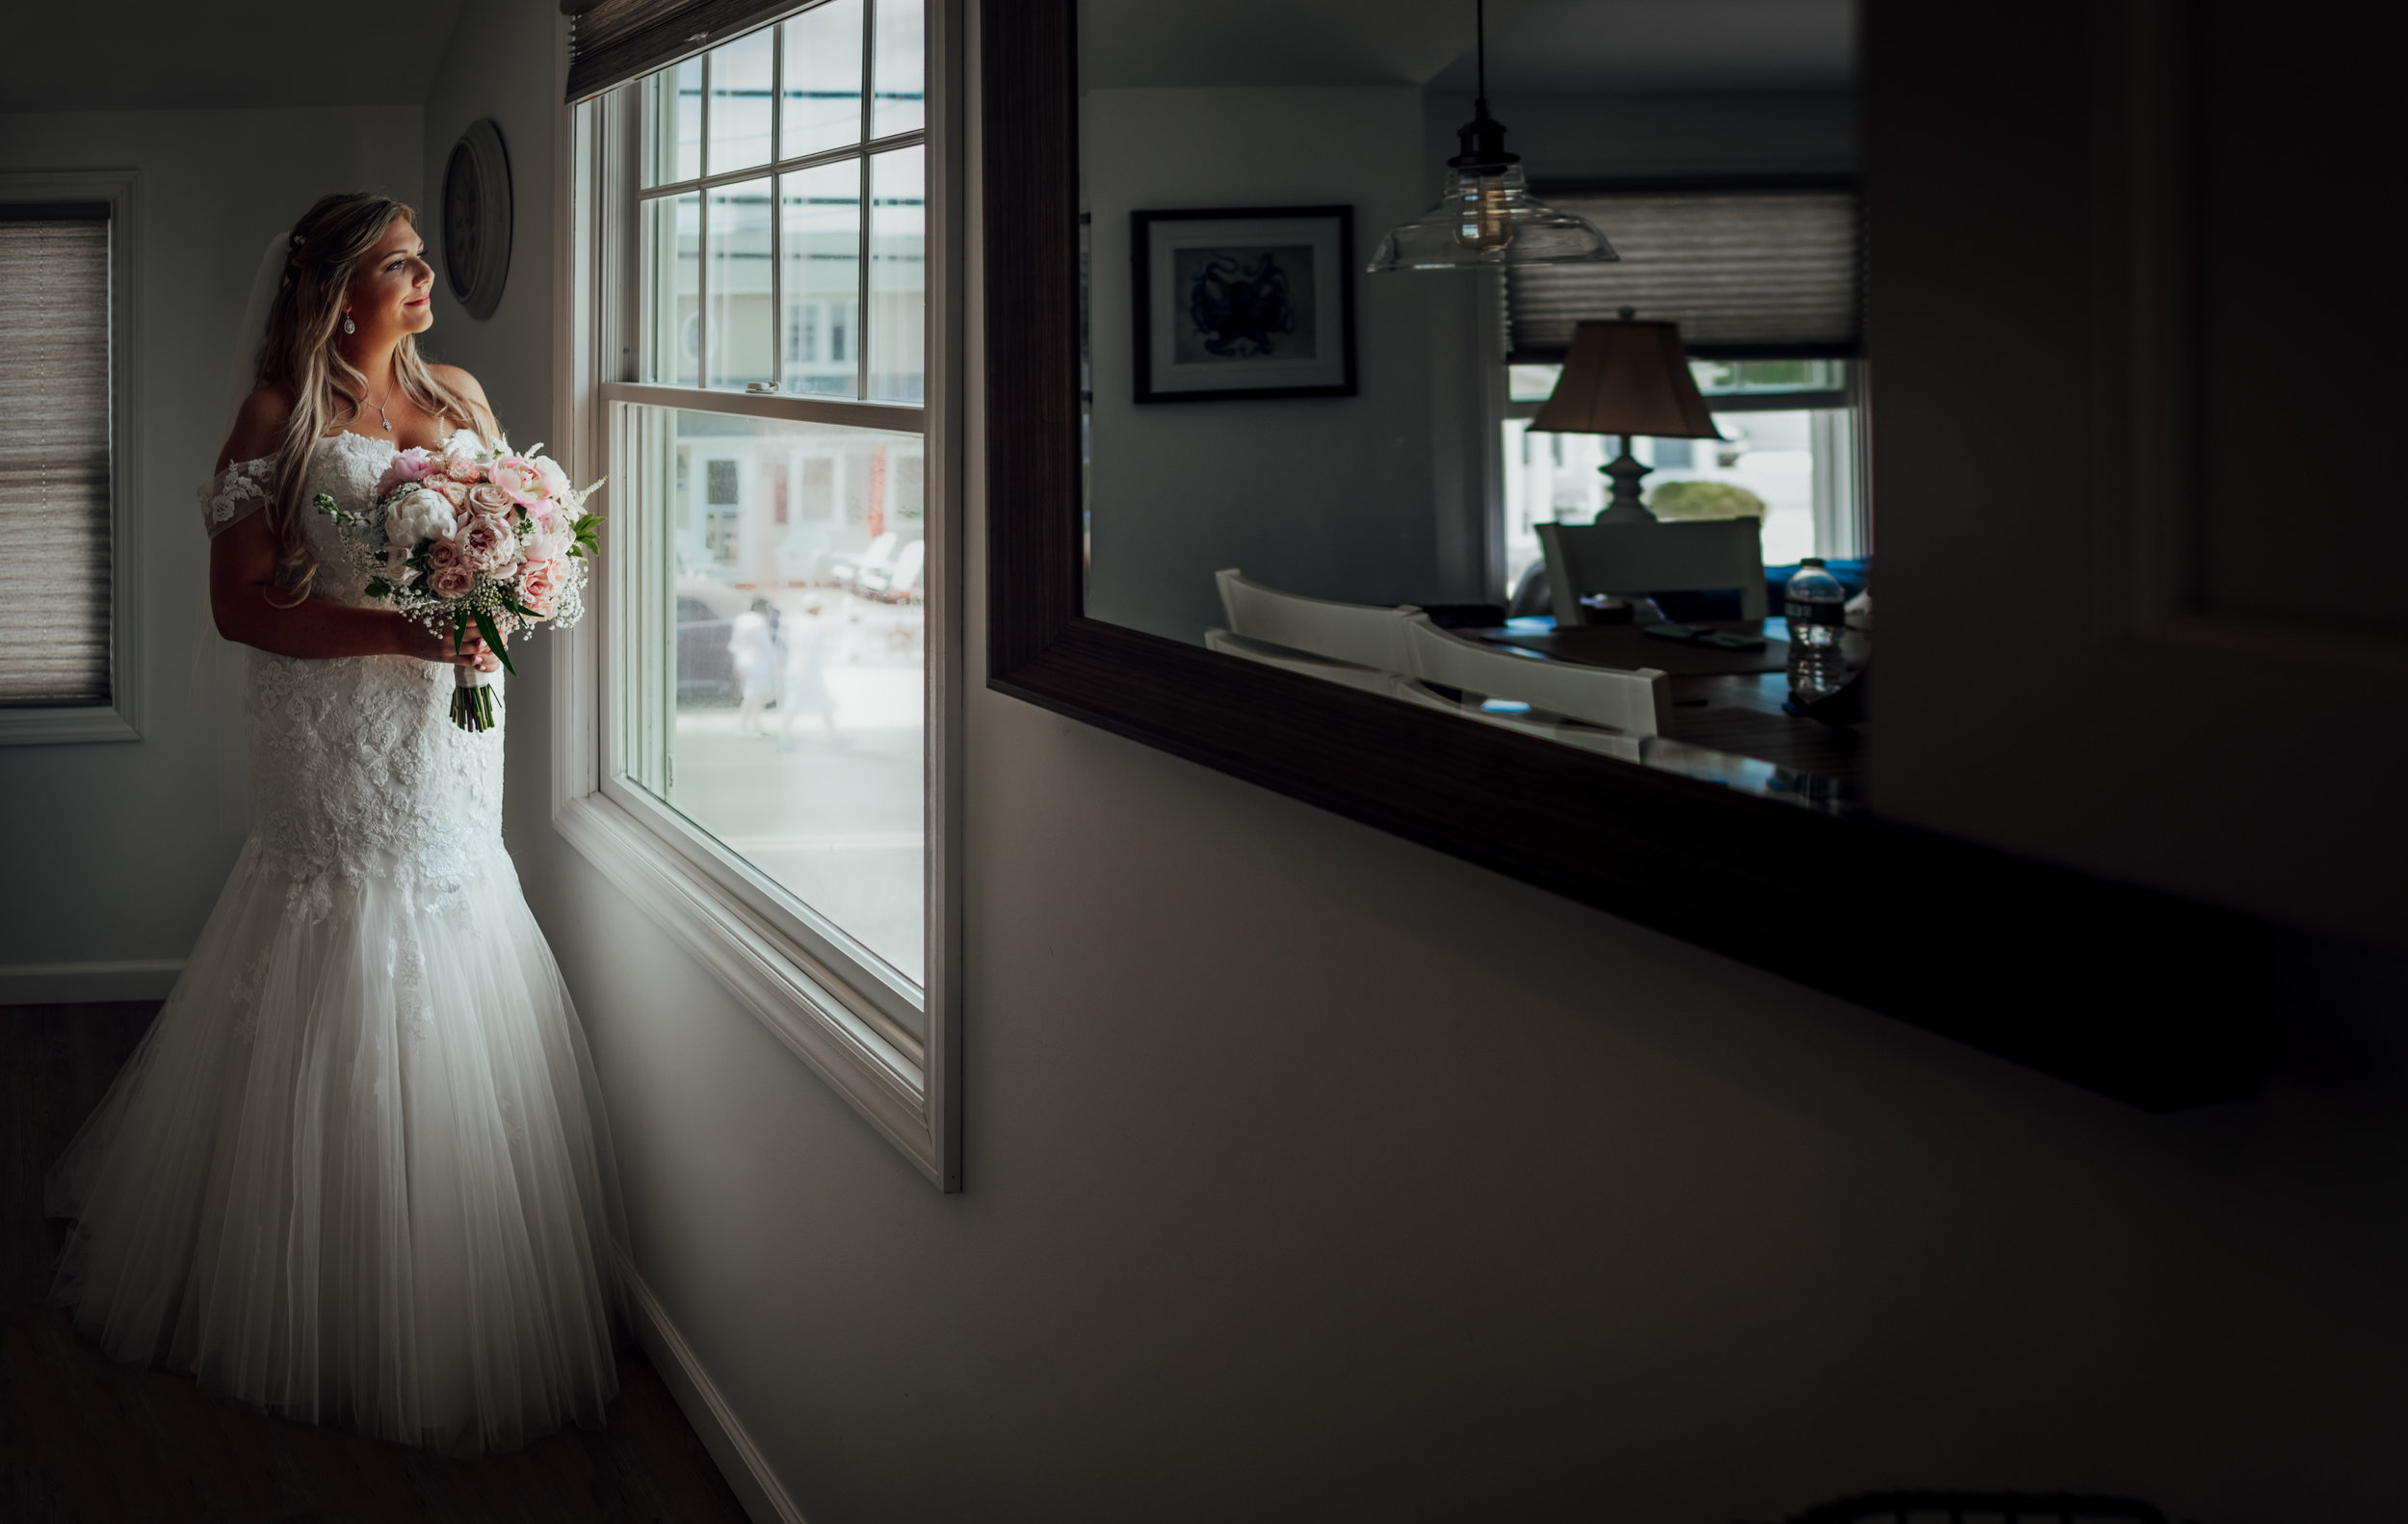 New Jersey Wedding Photographer, Felsberg Photography LBI wedding photography 36.jpg